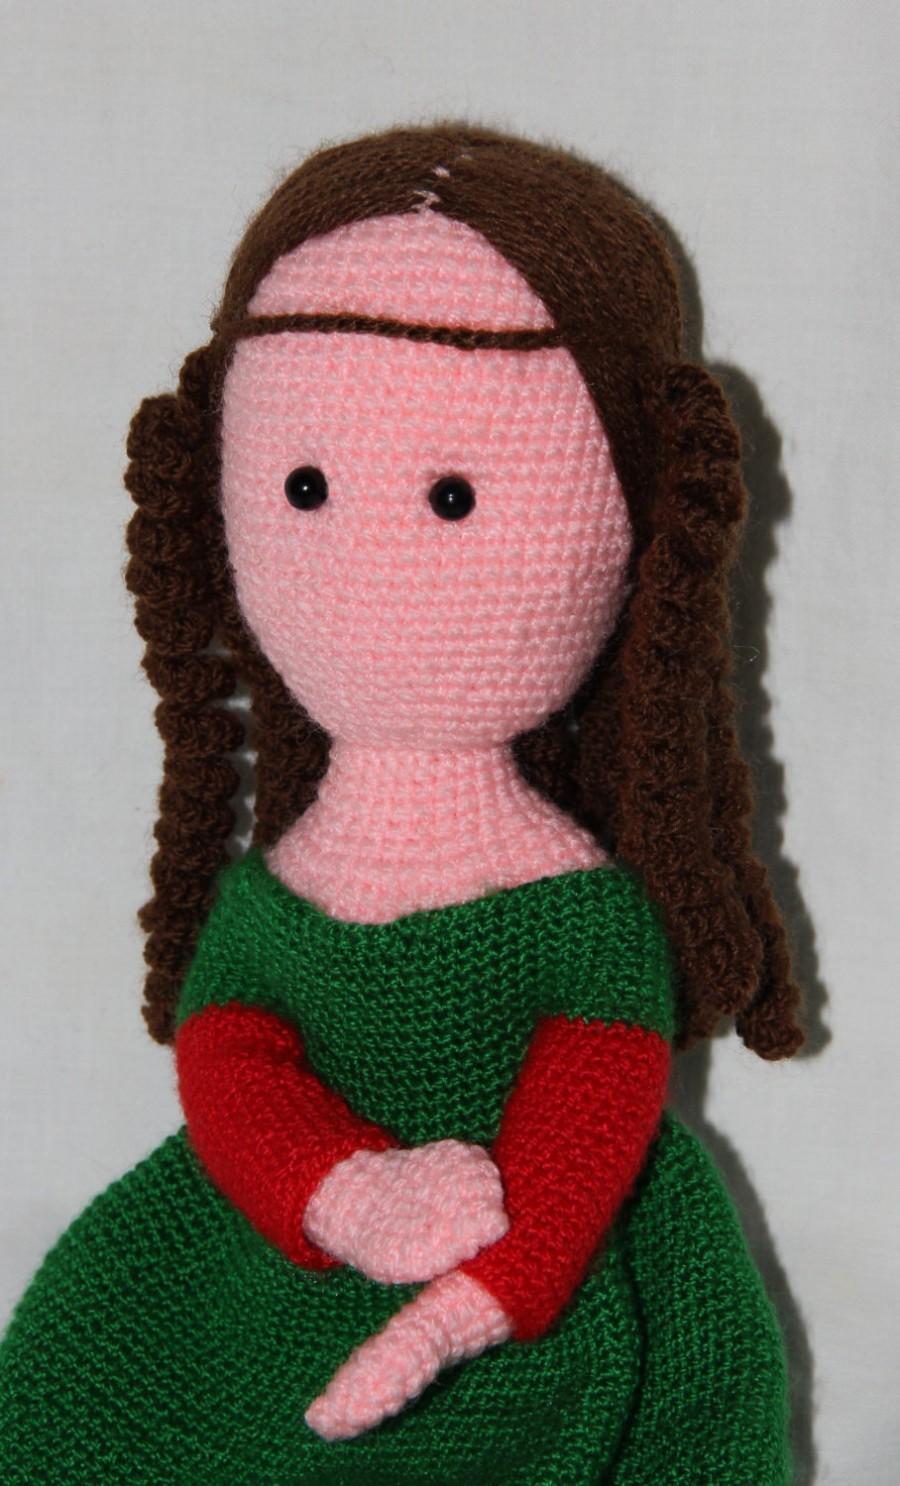 Boda - Mona Lisa, Crochet Mona Lisa doll, Amigurumi, Crochet doll, Gift for her, Handmade